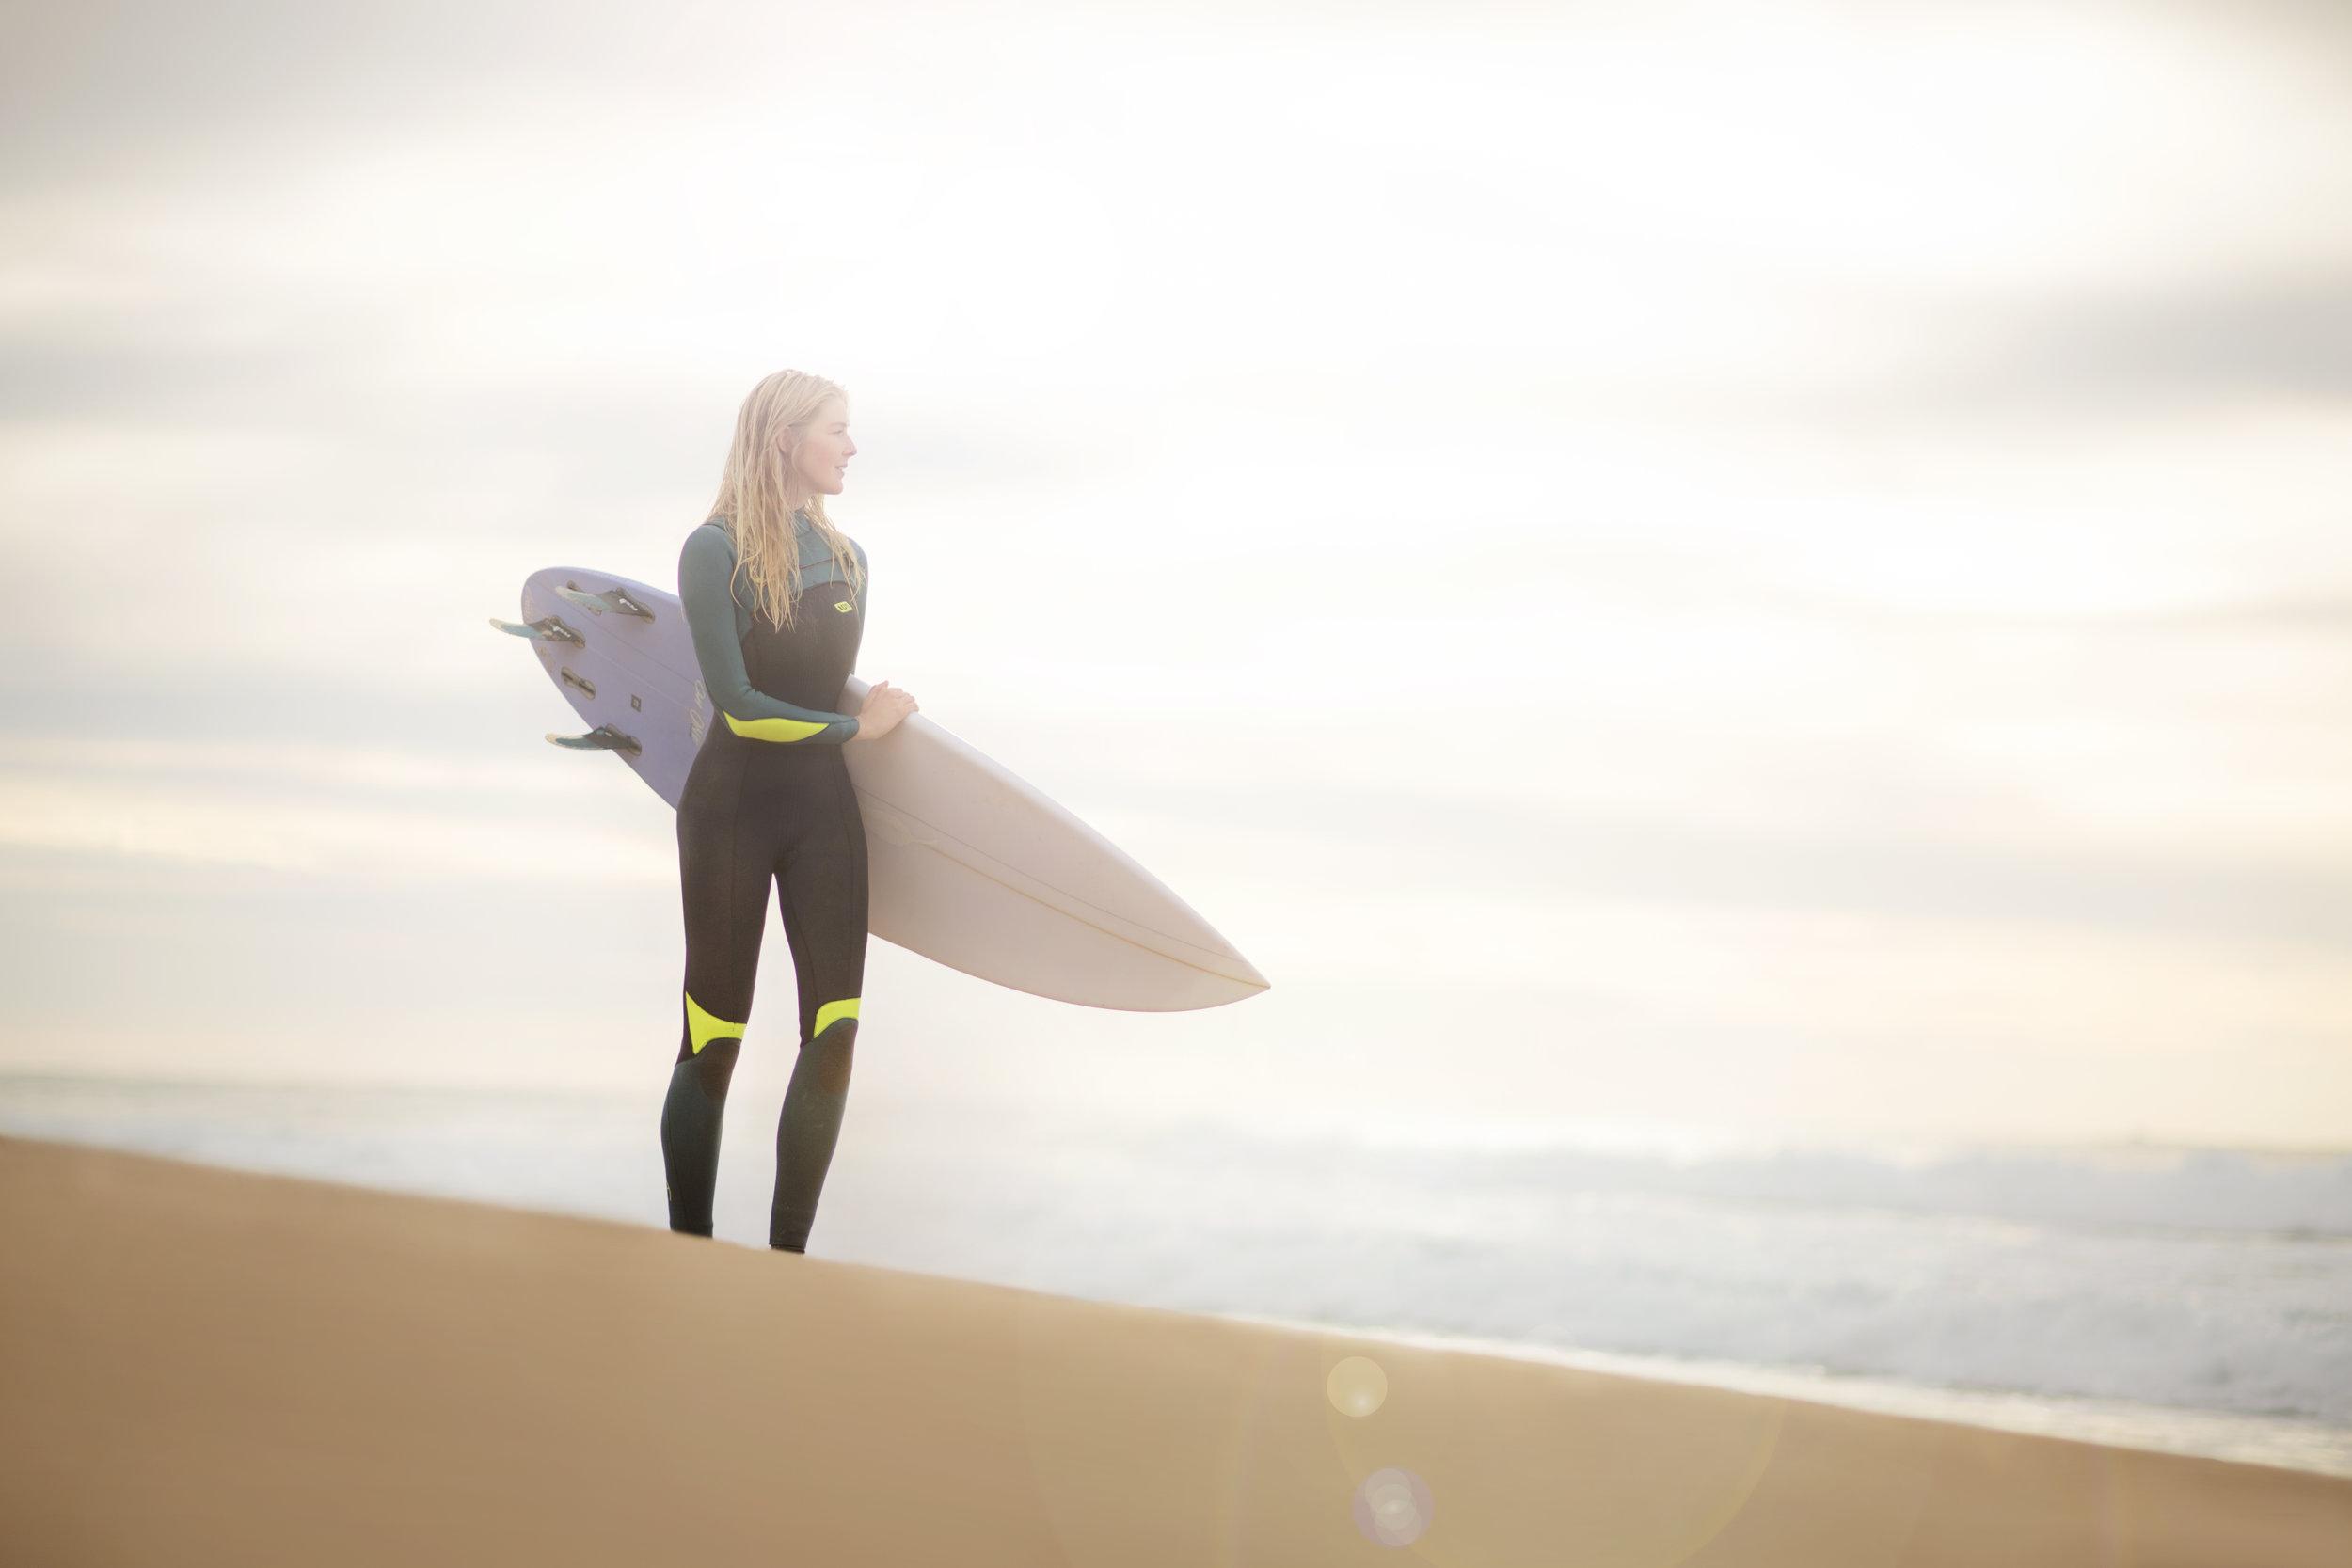 Caroline Pemberton_Surf_Photo: Mark Watson